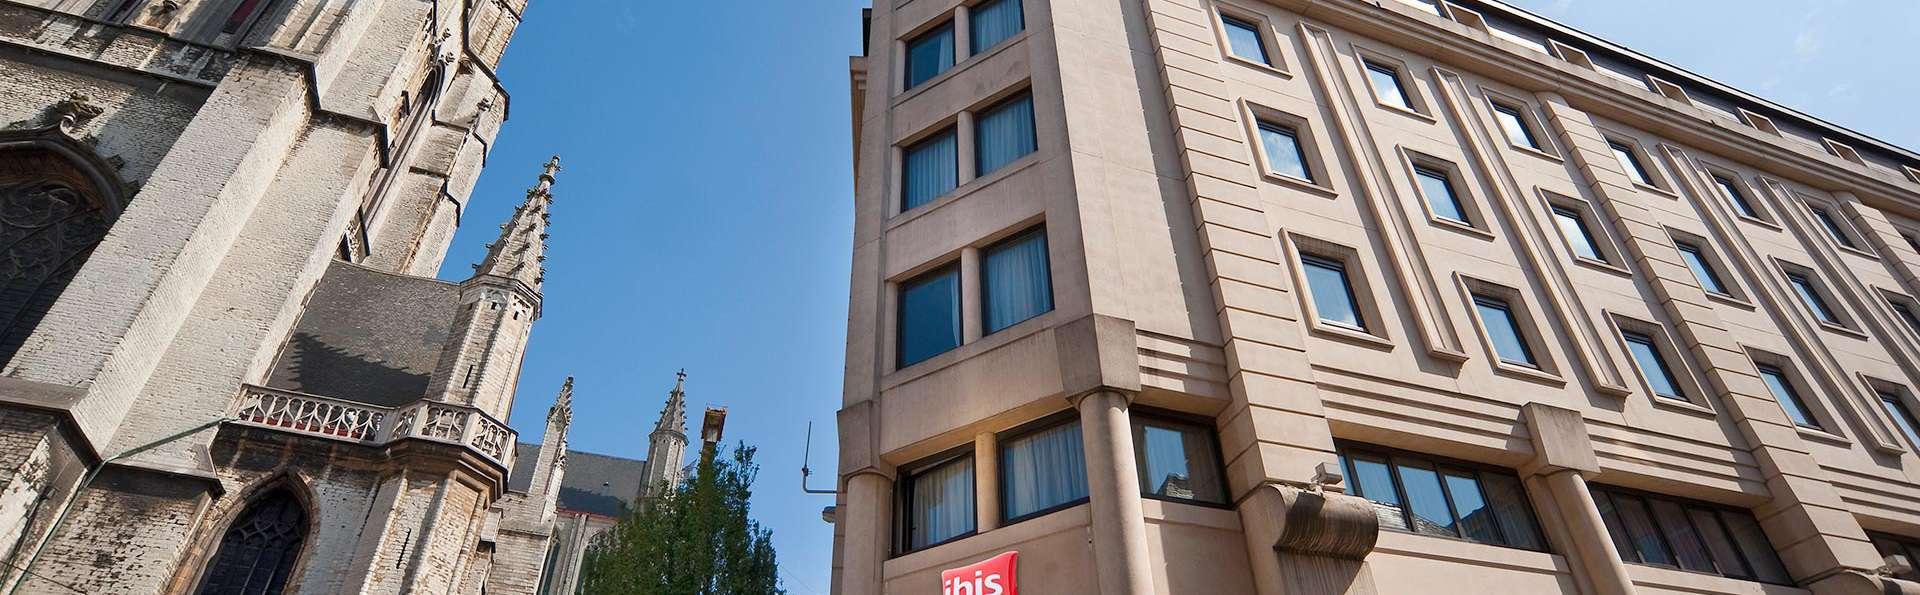 Hotel ibis gent centrum sint baafs kathedraal charmehotel gent - Verblijf kathedraal ...